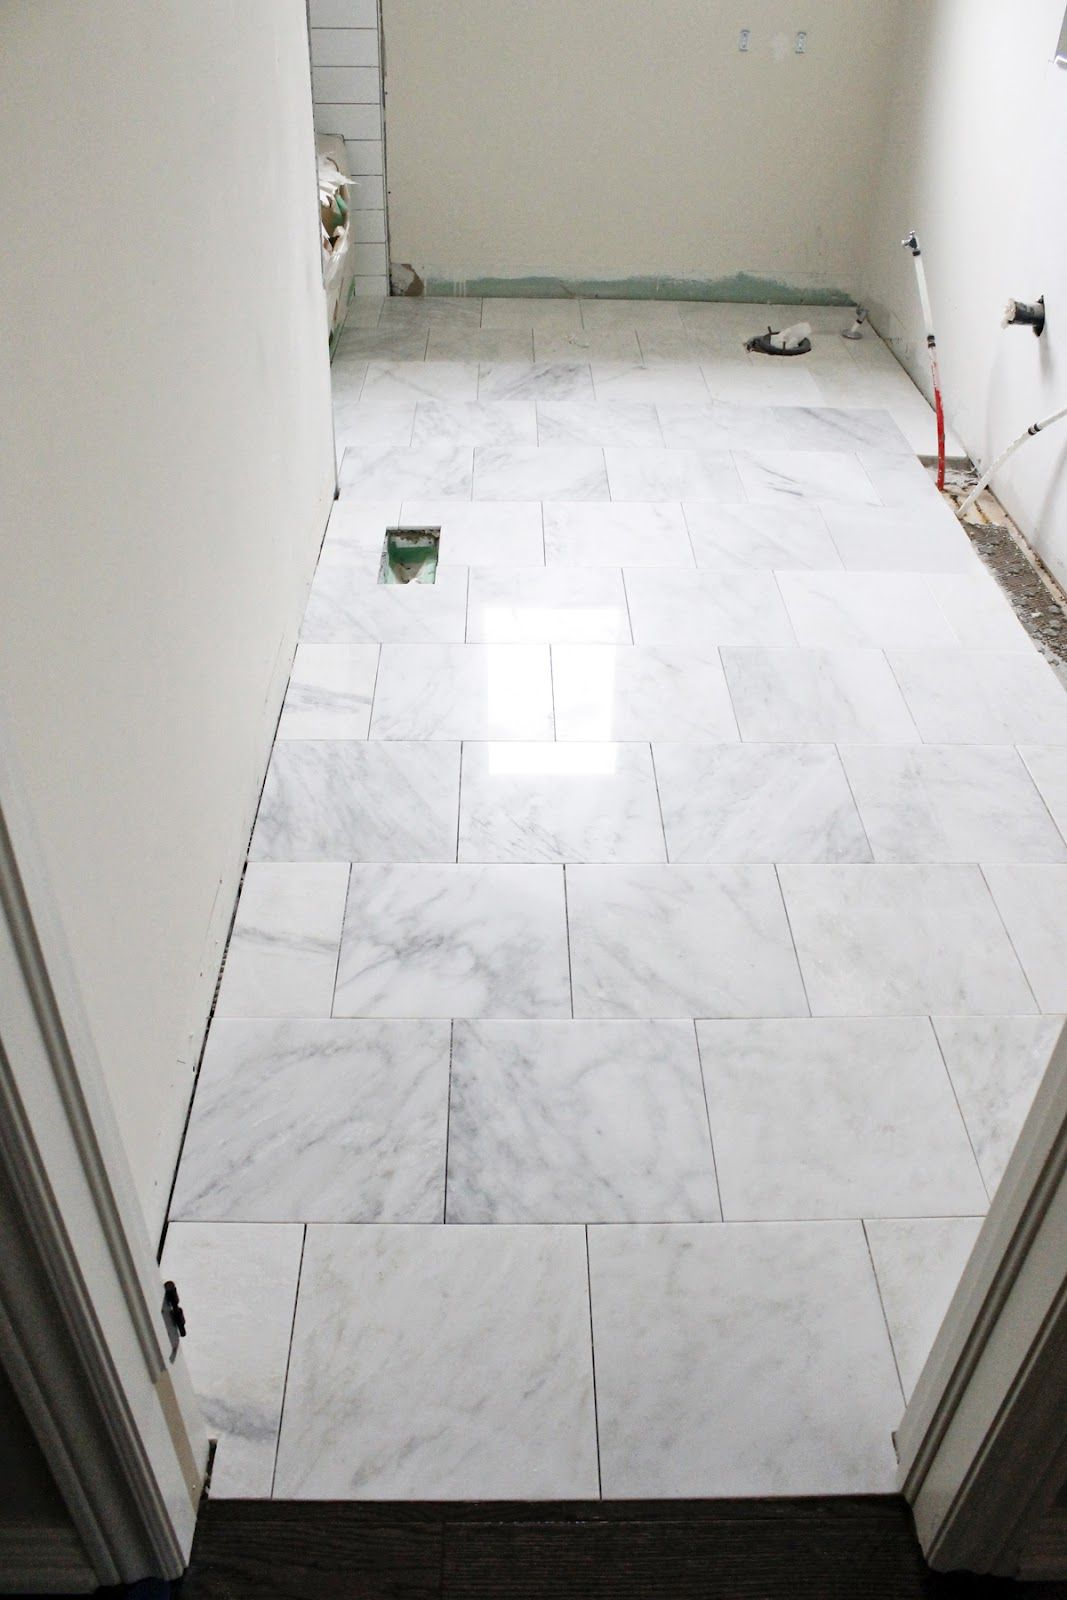 Brick Pattern Marble Floors Bathroom Floor Tiles Tile Floor Patterned Floor Tiles